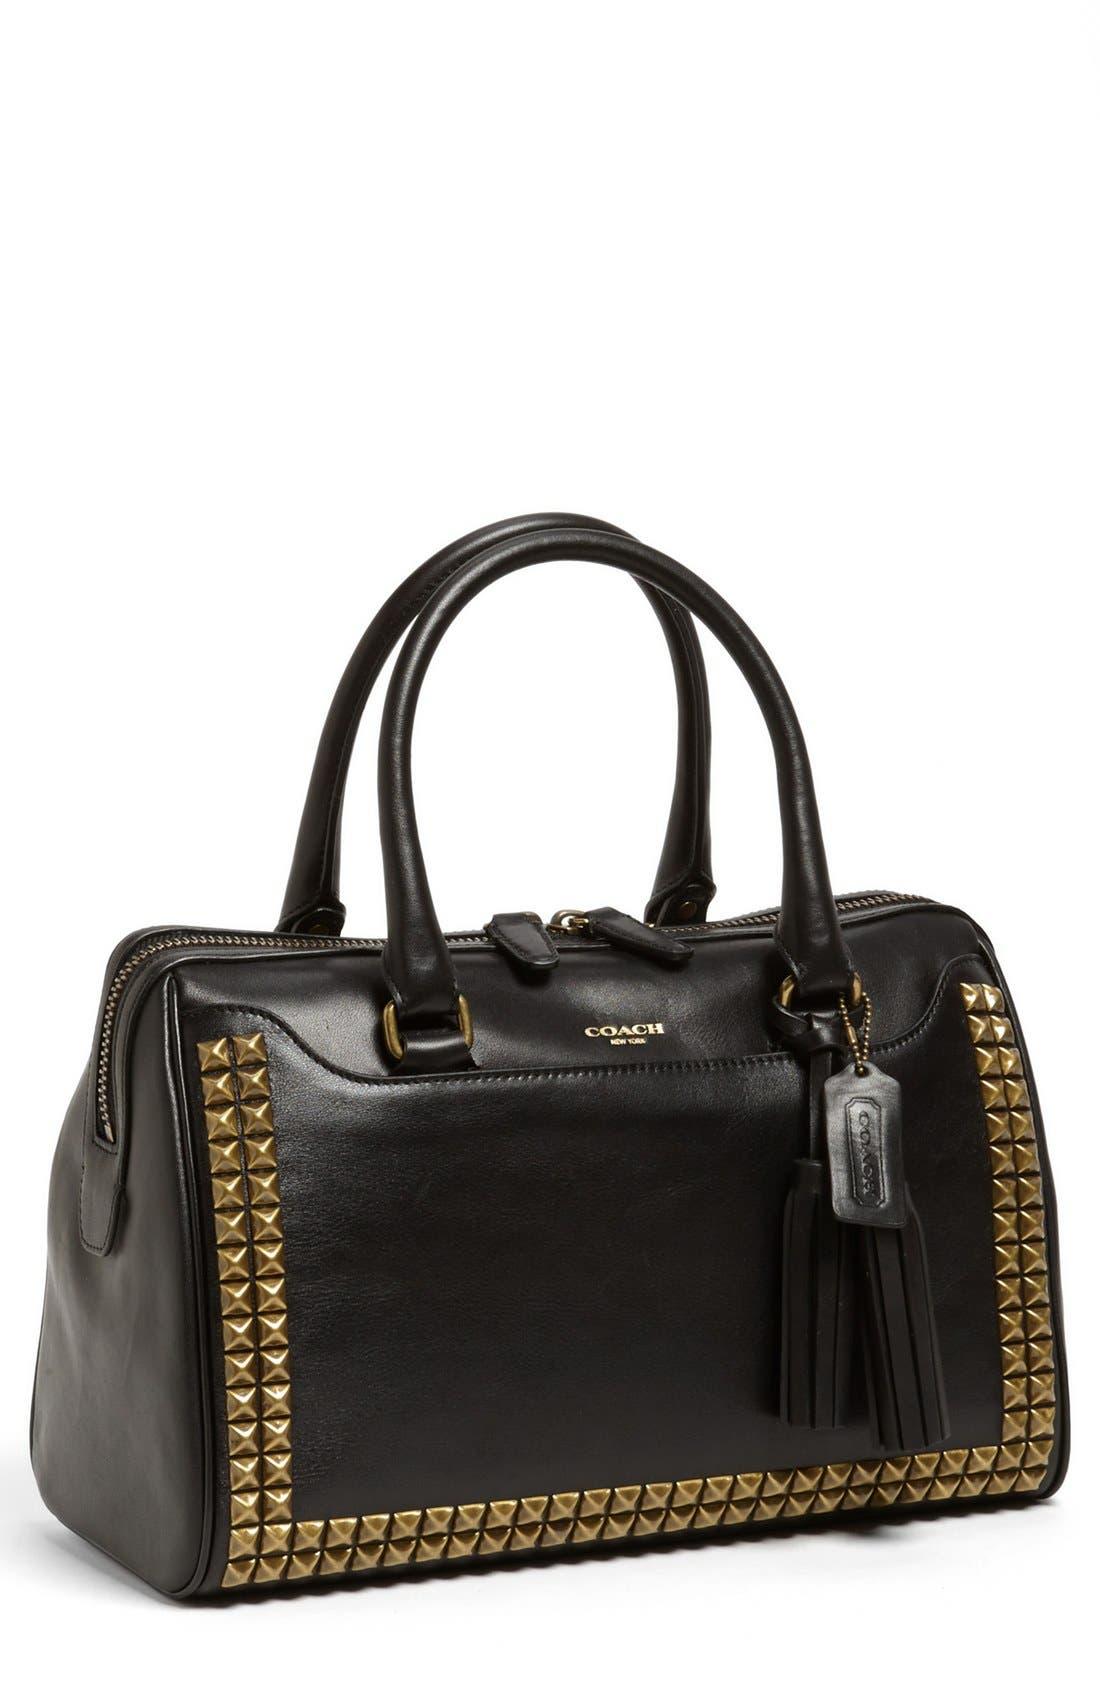 Alternate Image 1 Selected - COACH 'Legacy Hayley - Stud' Leather Satchel